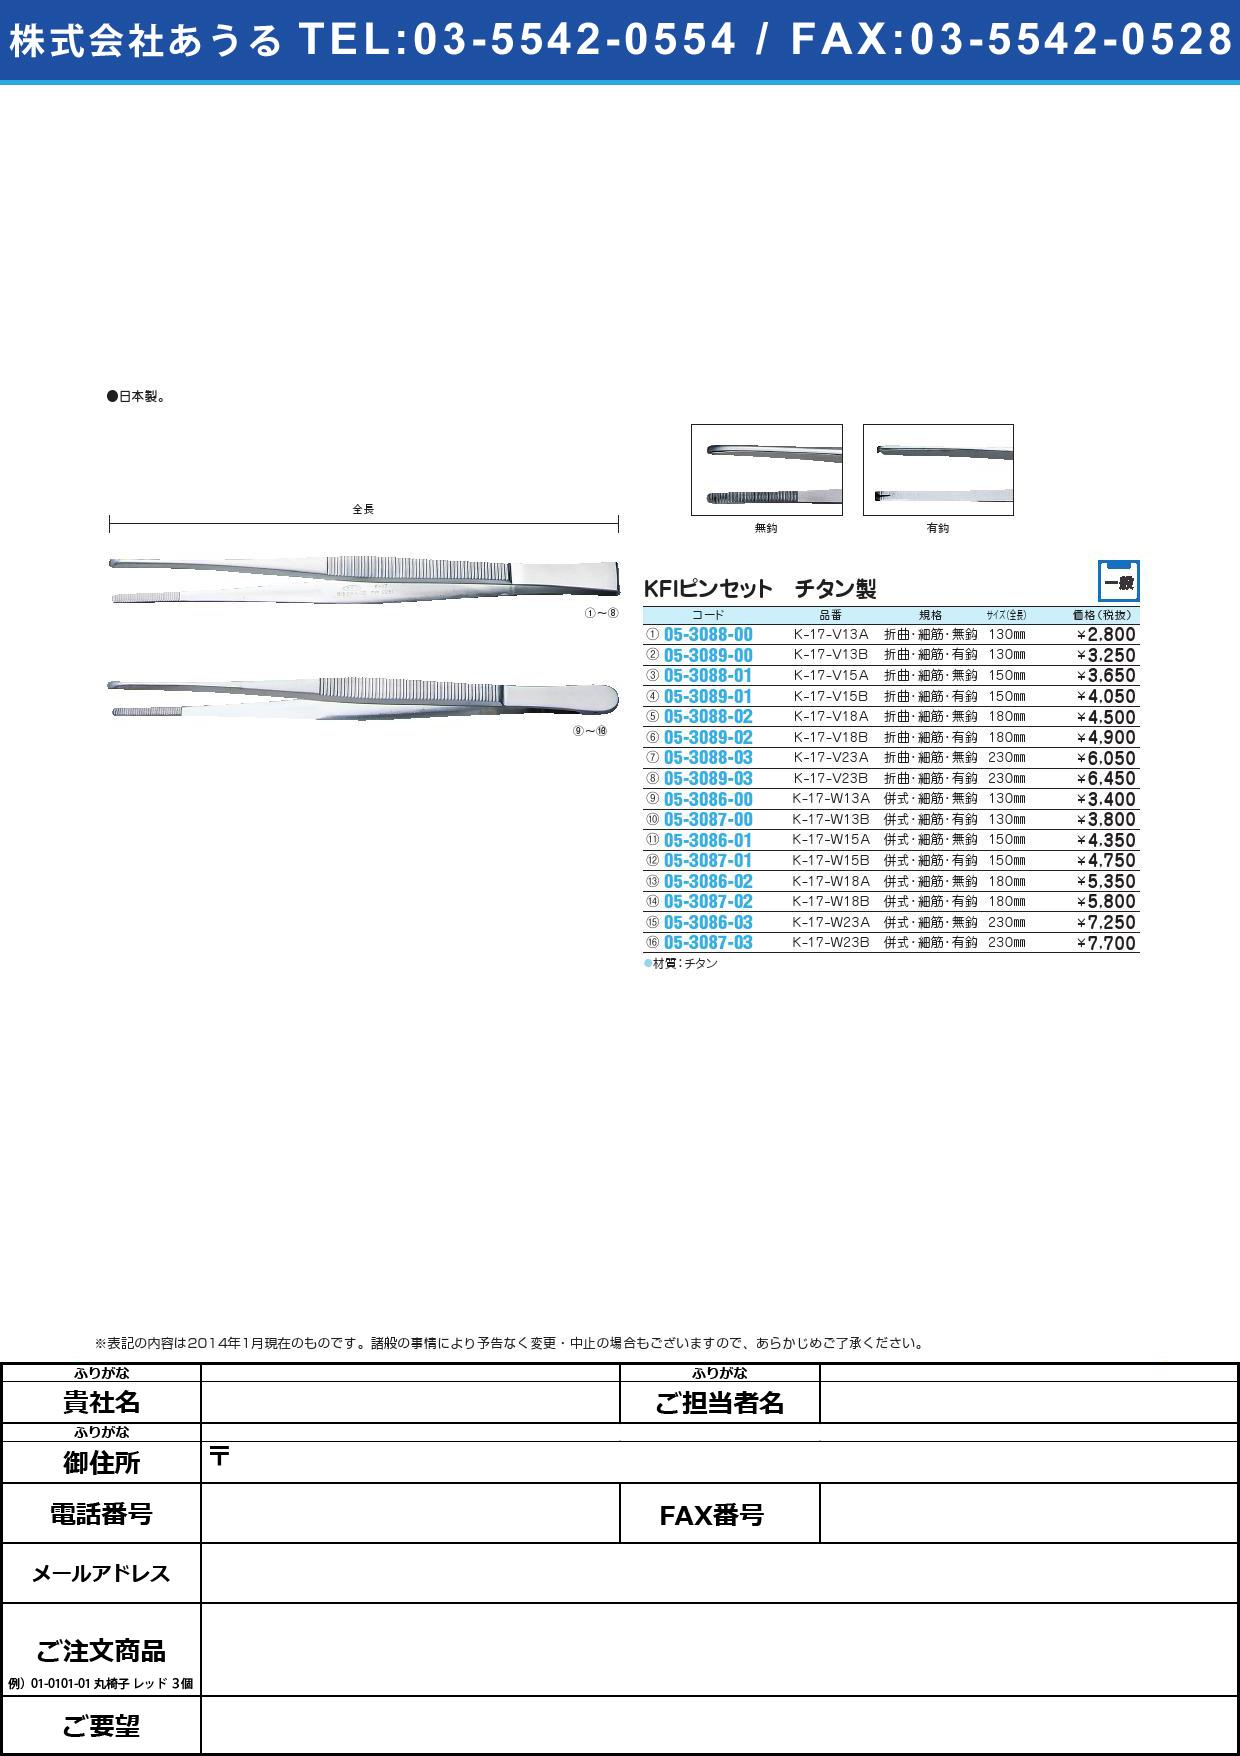 KFIピンセット 併式 細筋 有鈎 ピンセット(05-3087-03)K-17-W23B(チタン)230MM【1本単位】【2014年カタログ商品】